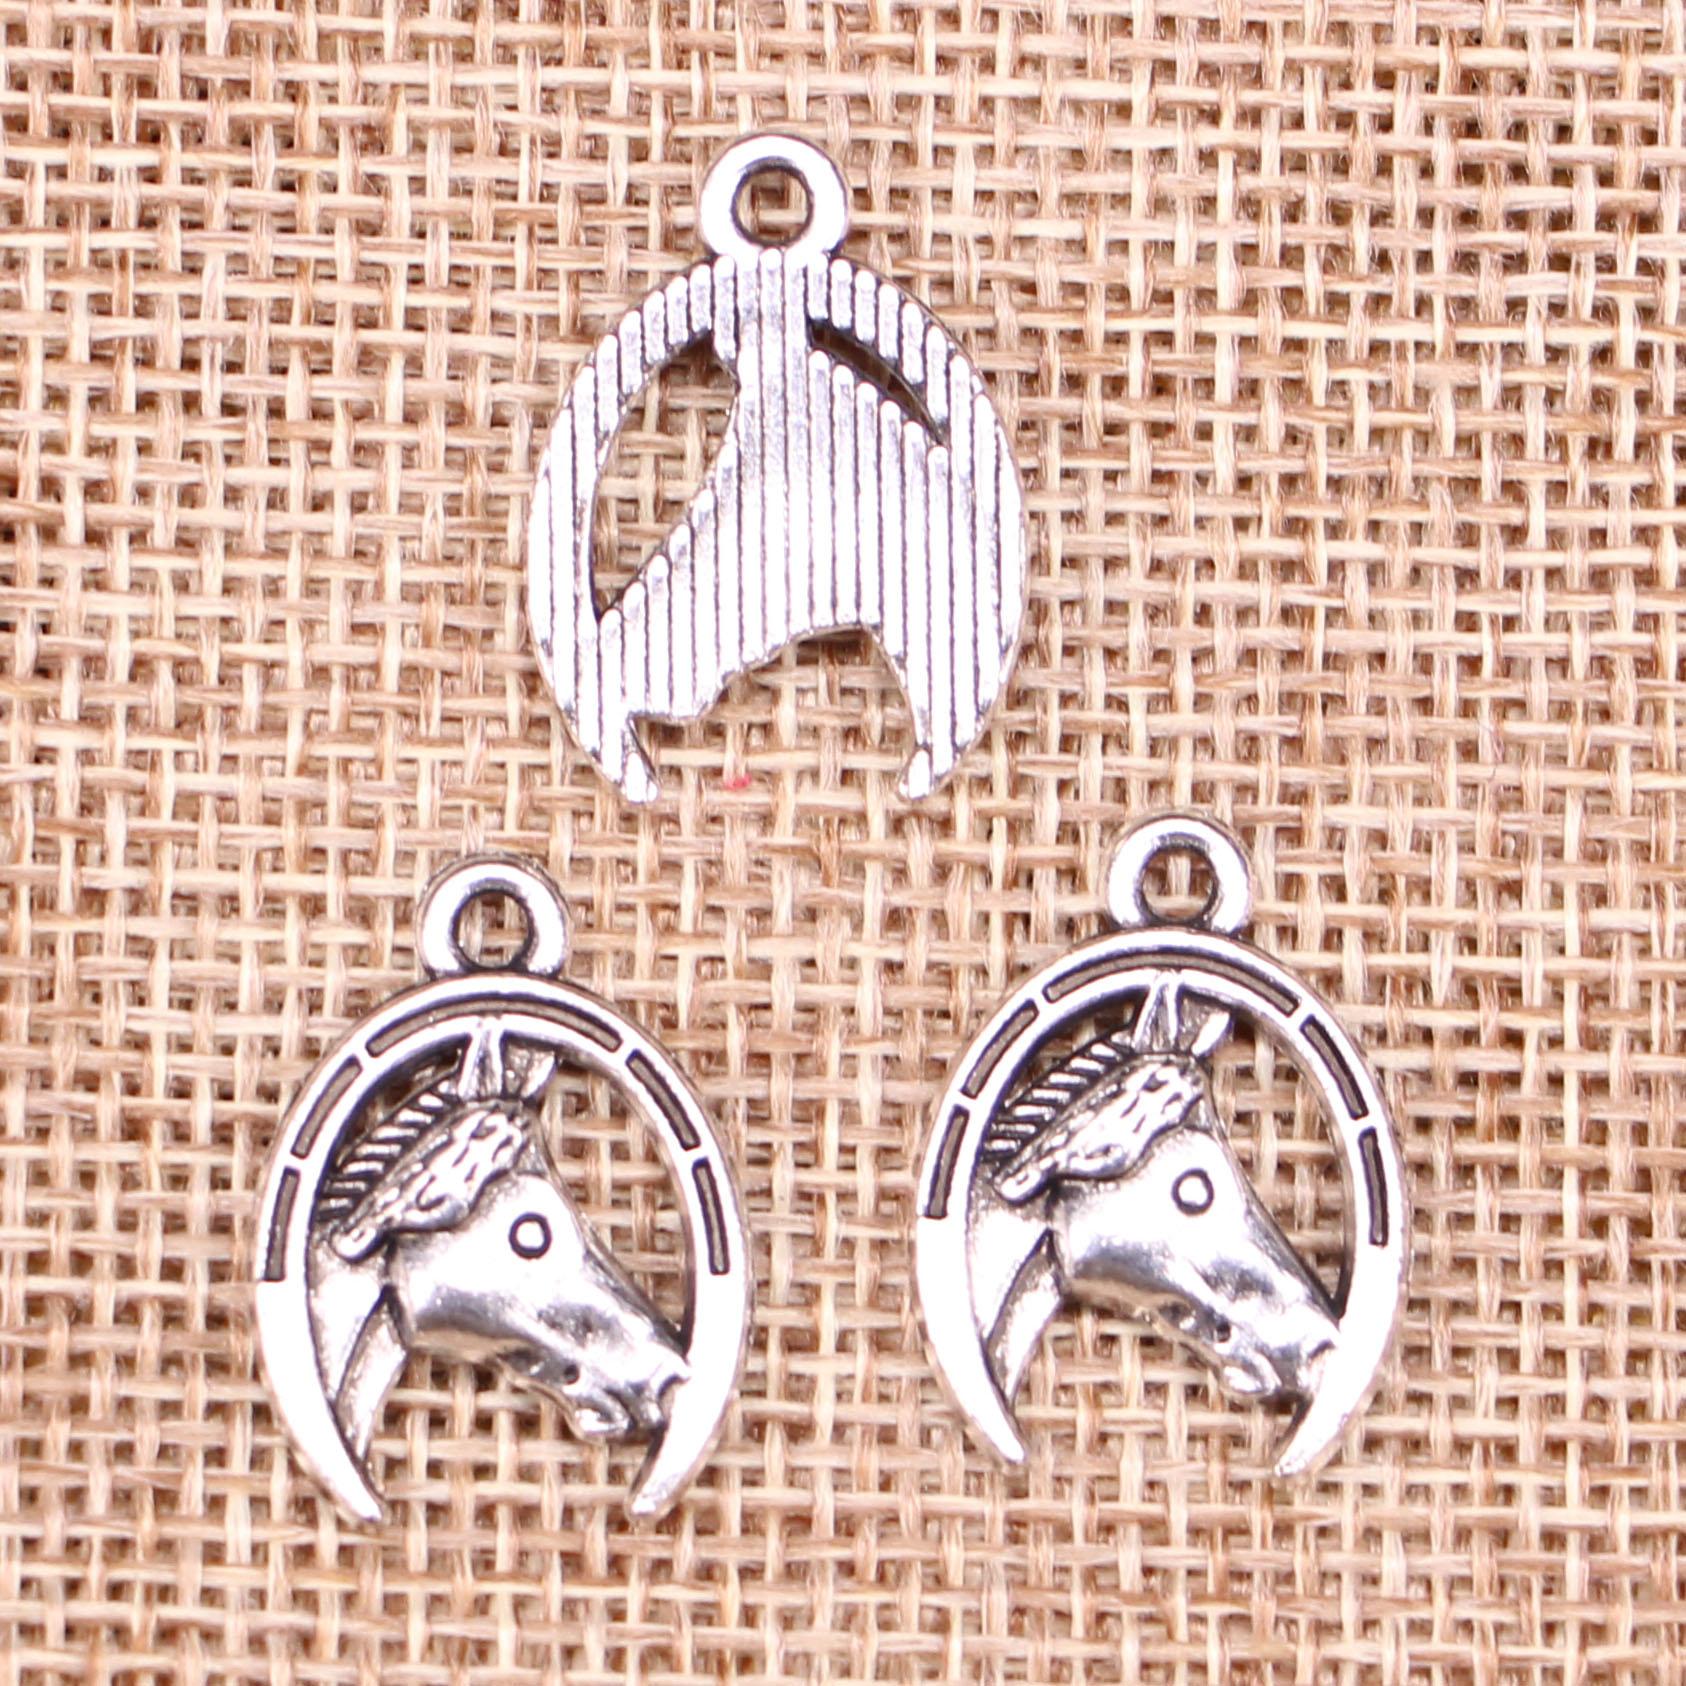 6pcs Charms Horse Head In Horseshoe 21x15mm Antique Making Pendant Fit,vintage Tibetan Silver,diy Bracelet Necklace Jewelry Sets & More